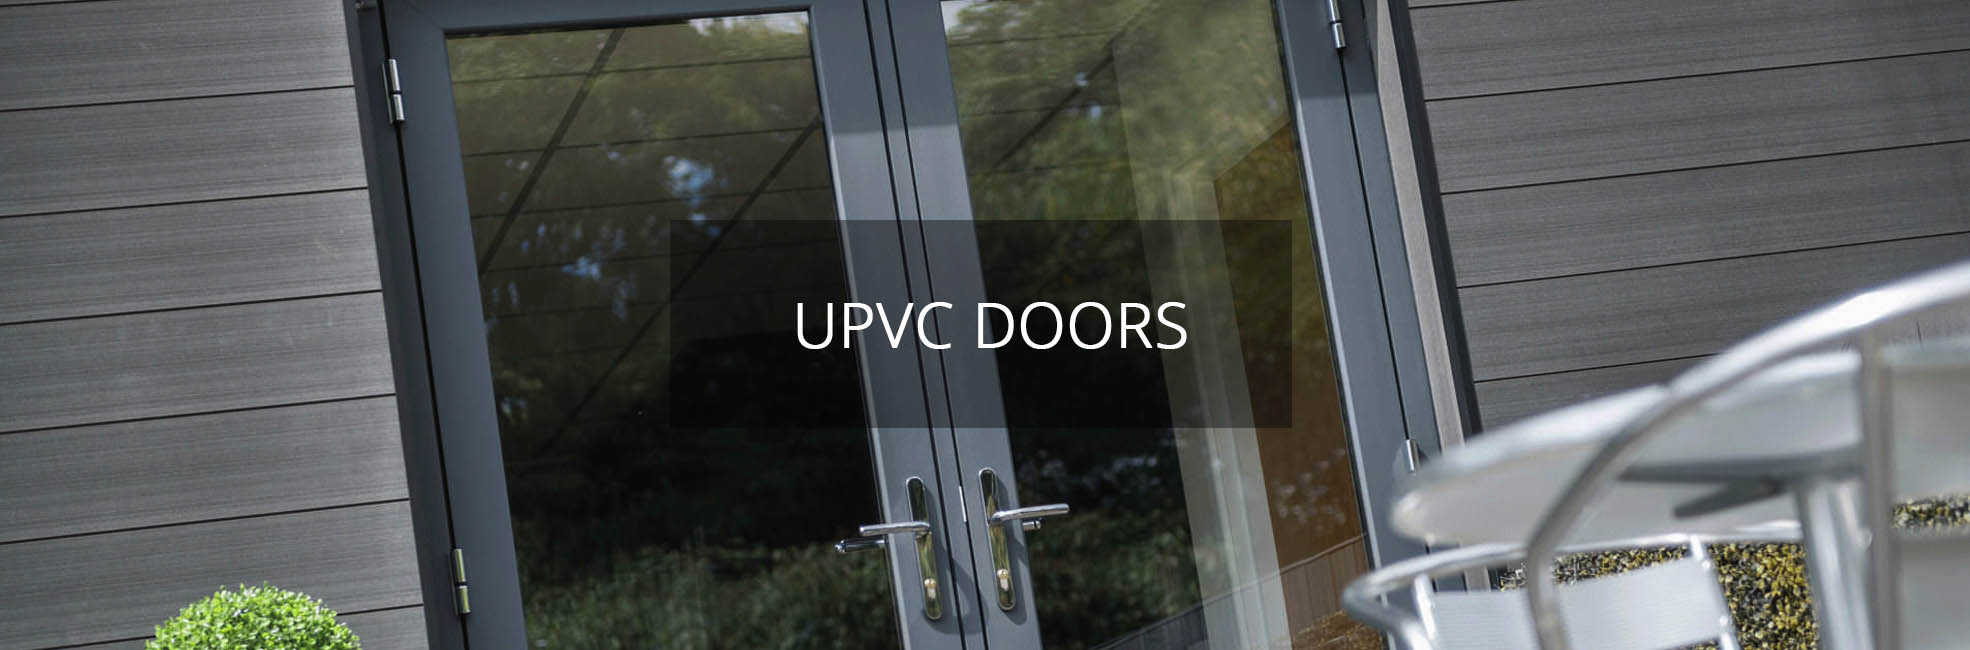 UPVC Doors Northampton